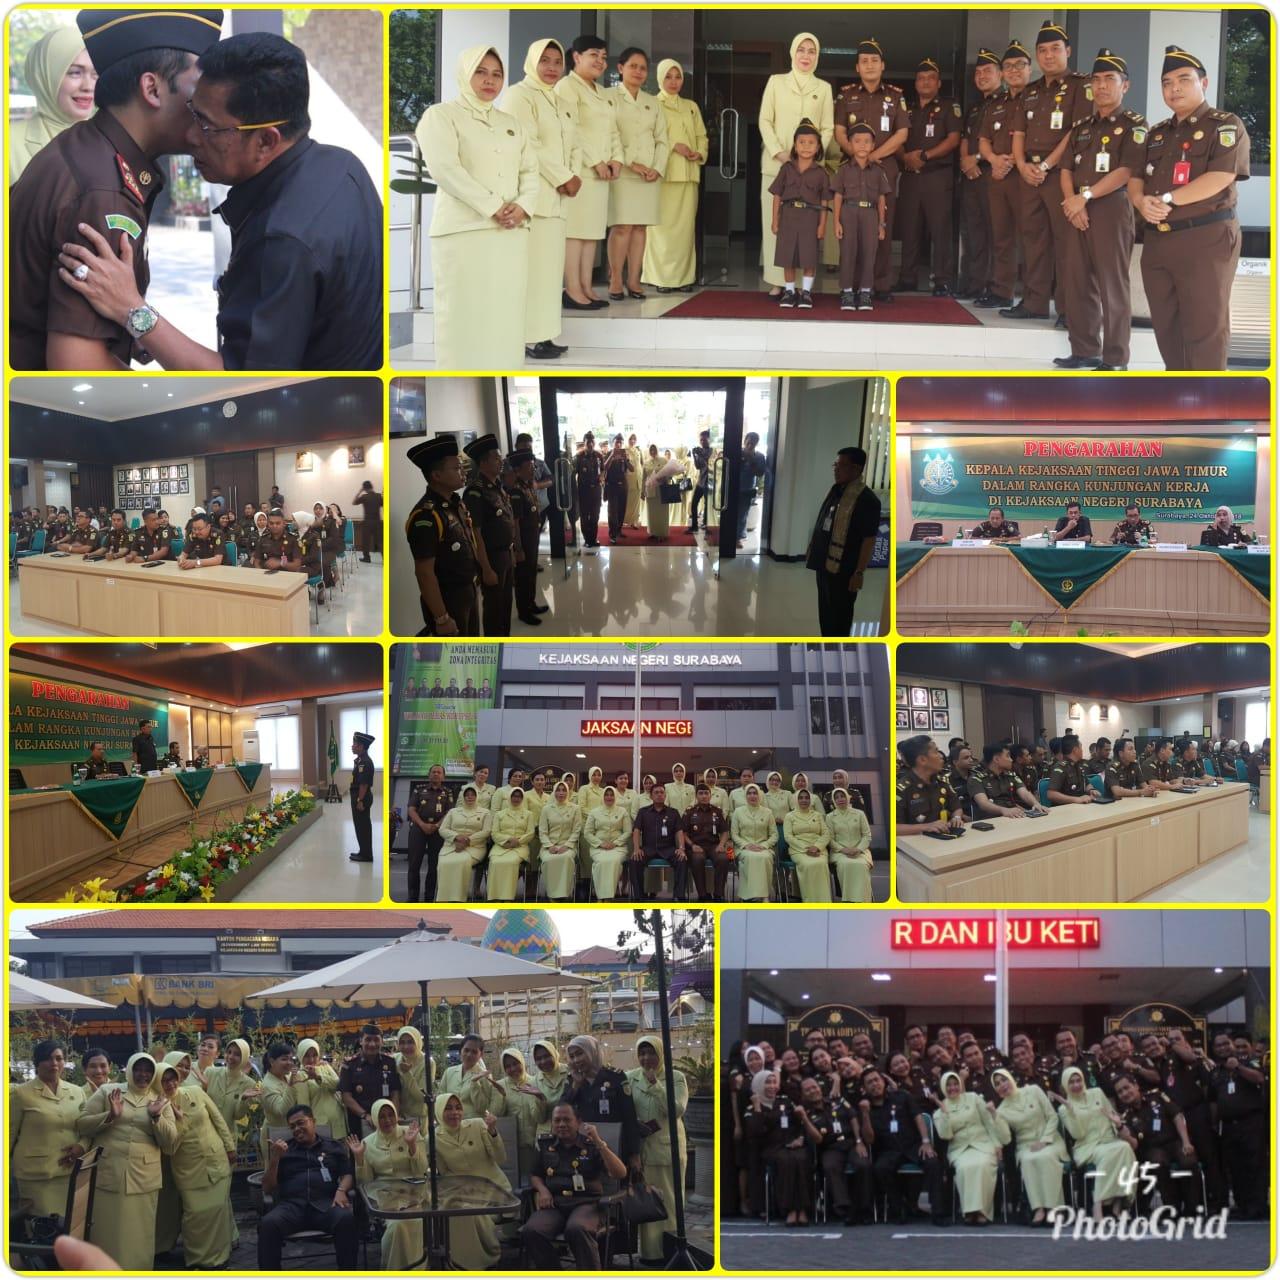 Kunjungan Kepala Kejaksaan Tinggi Jawa Timur 24-10-2018